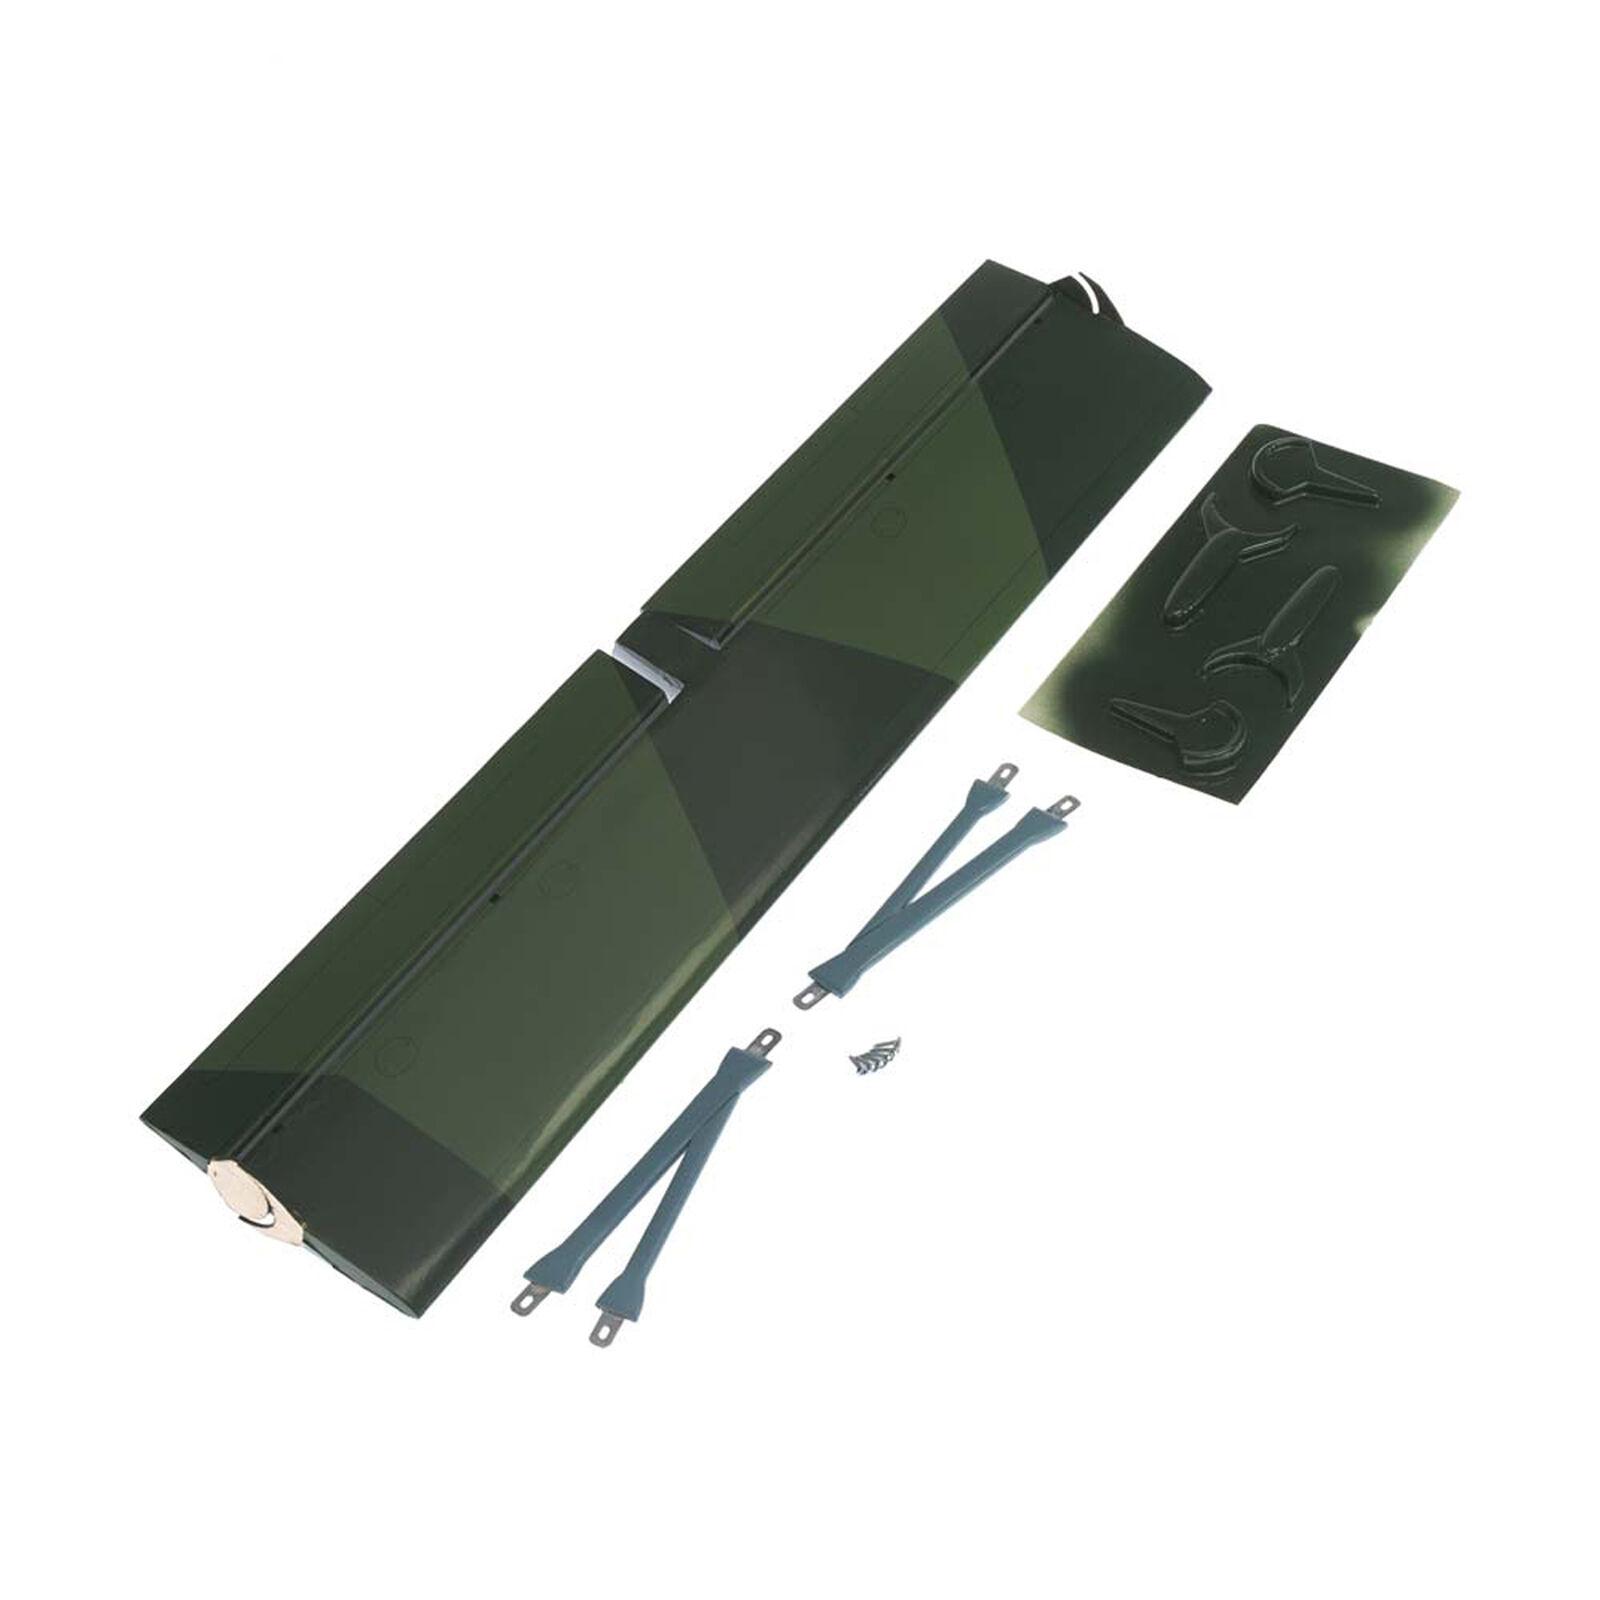 Horizontal Stabilizer Stuka 1.20 20cc EP